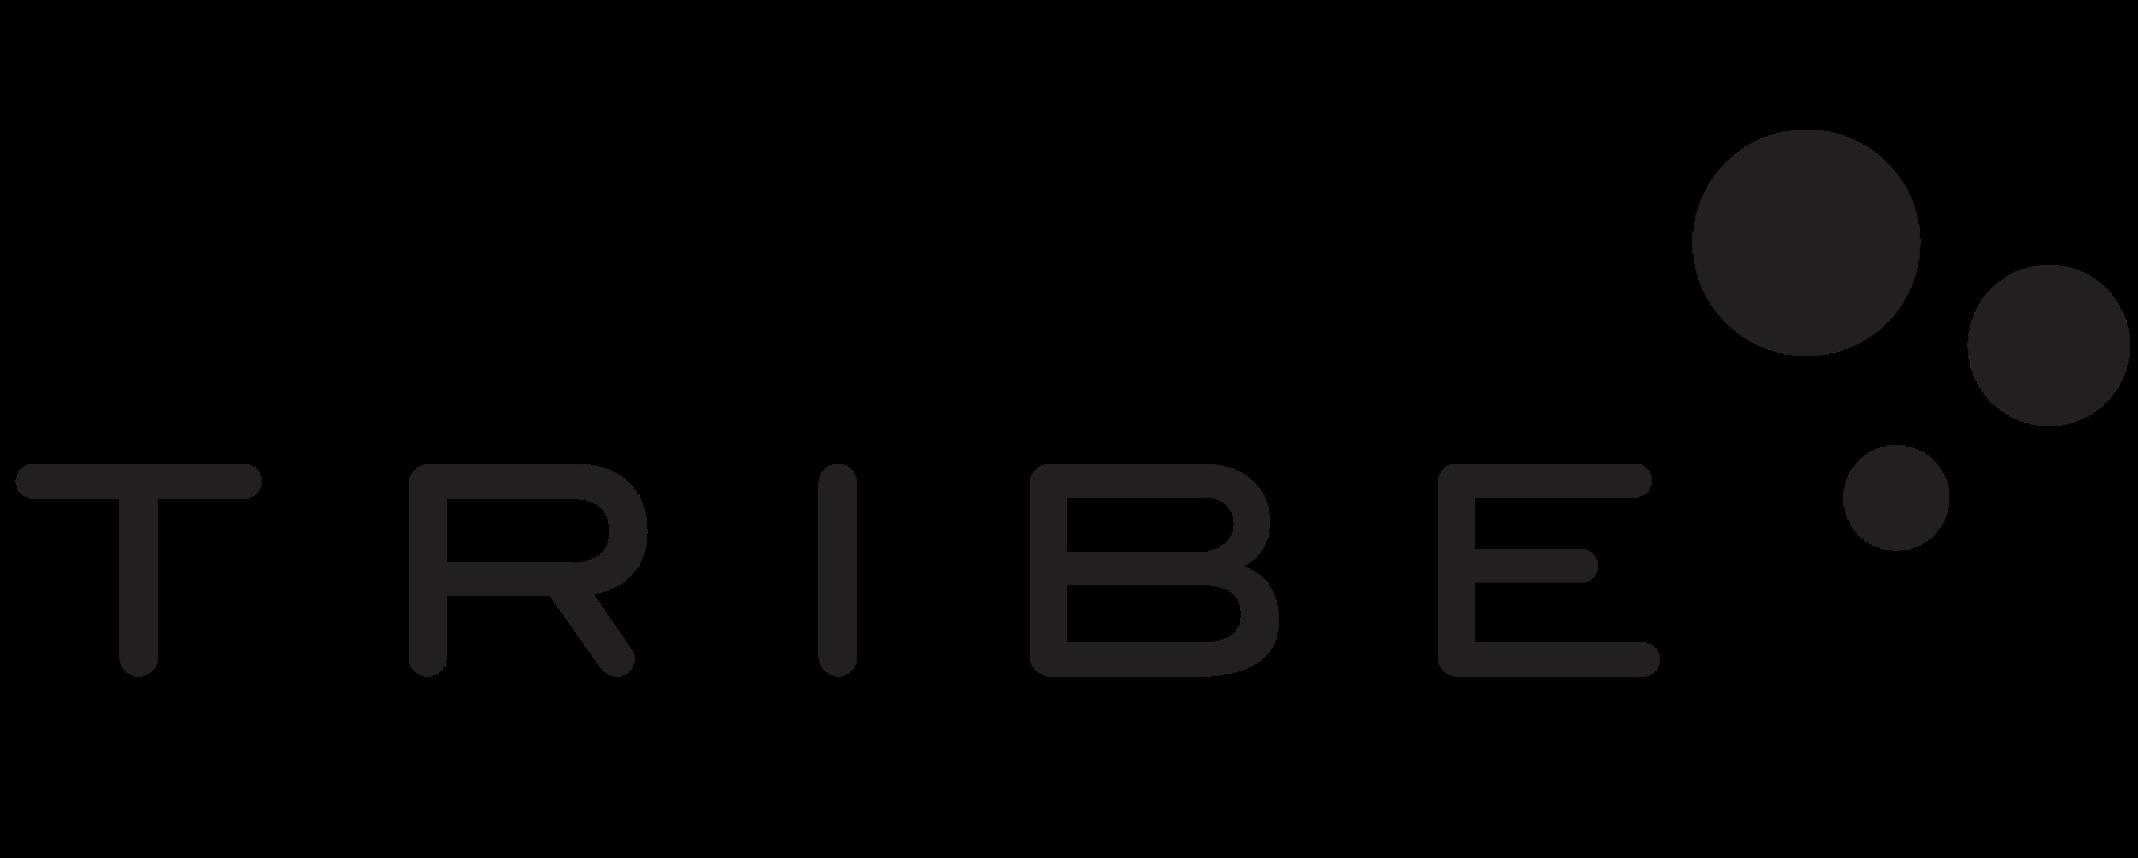 Influencer Marketing Platform For Brands & Agencies | TRIBE